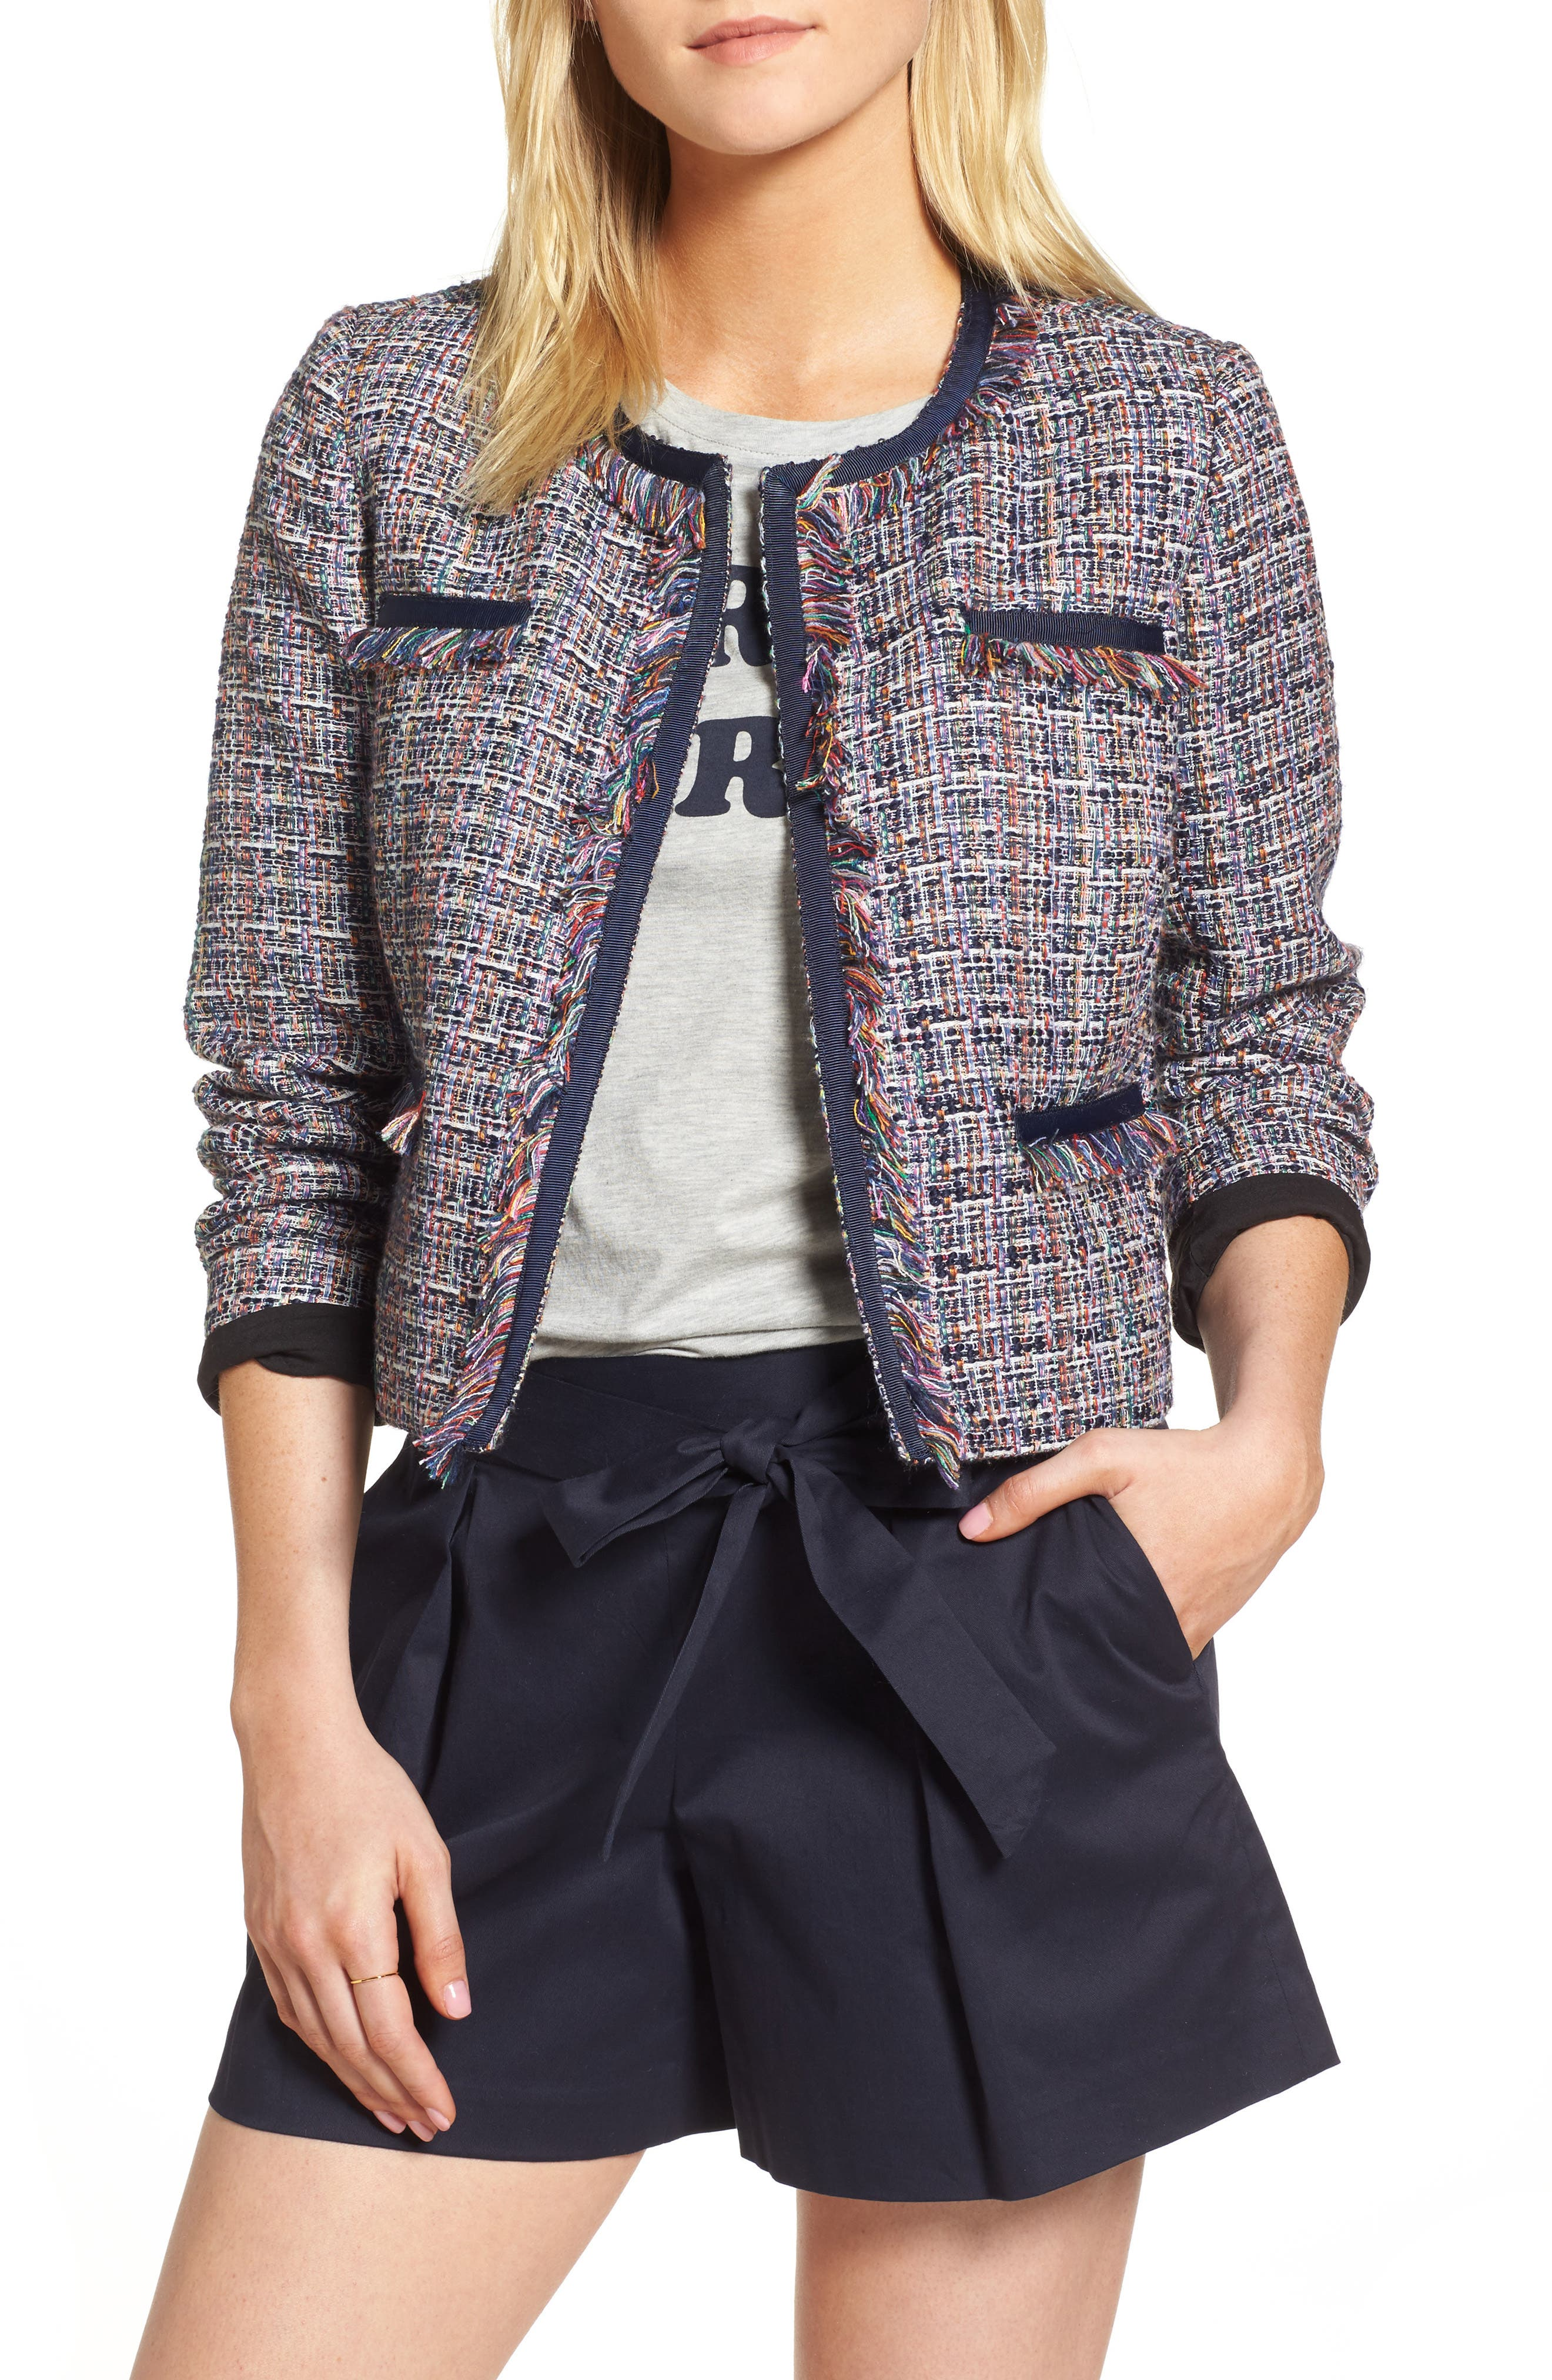 Main Image - 1901 Tweed Jacket